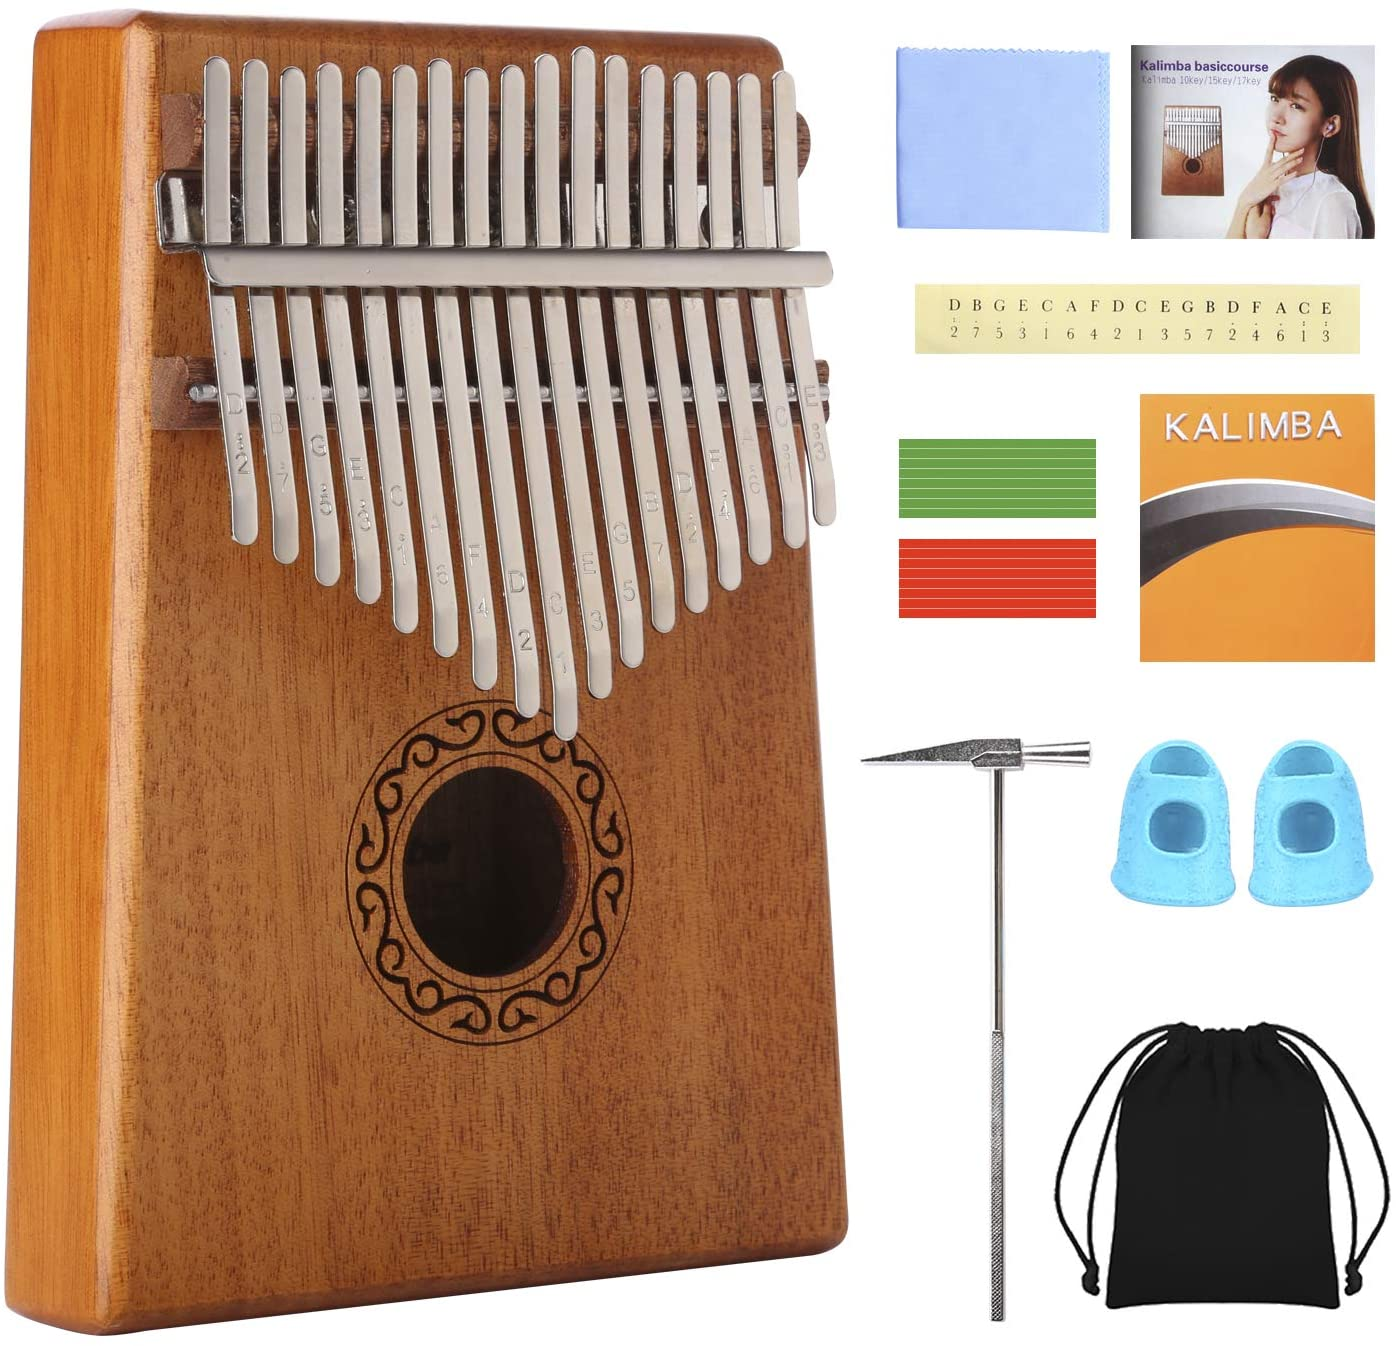 Kalimba 17 Teclas,Piano de pulgar con bolsa protectora